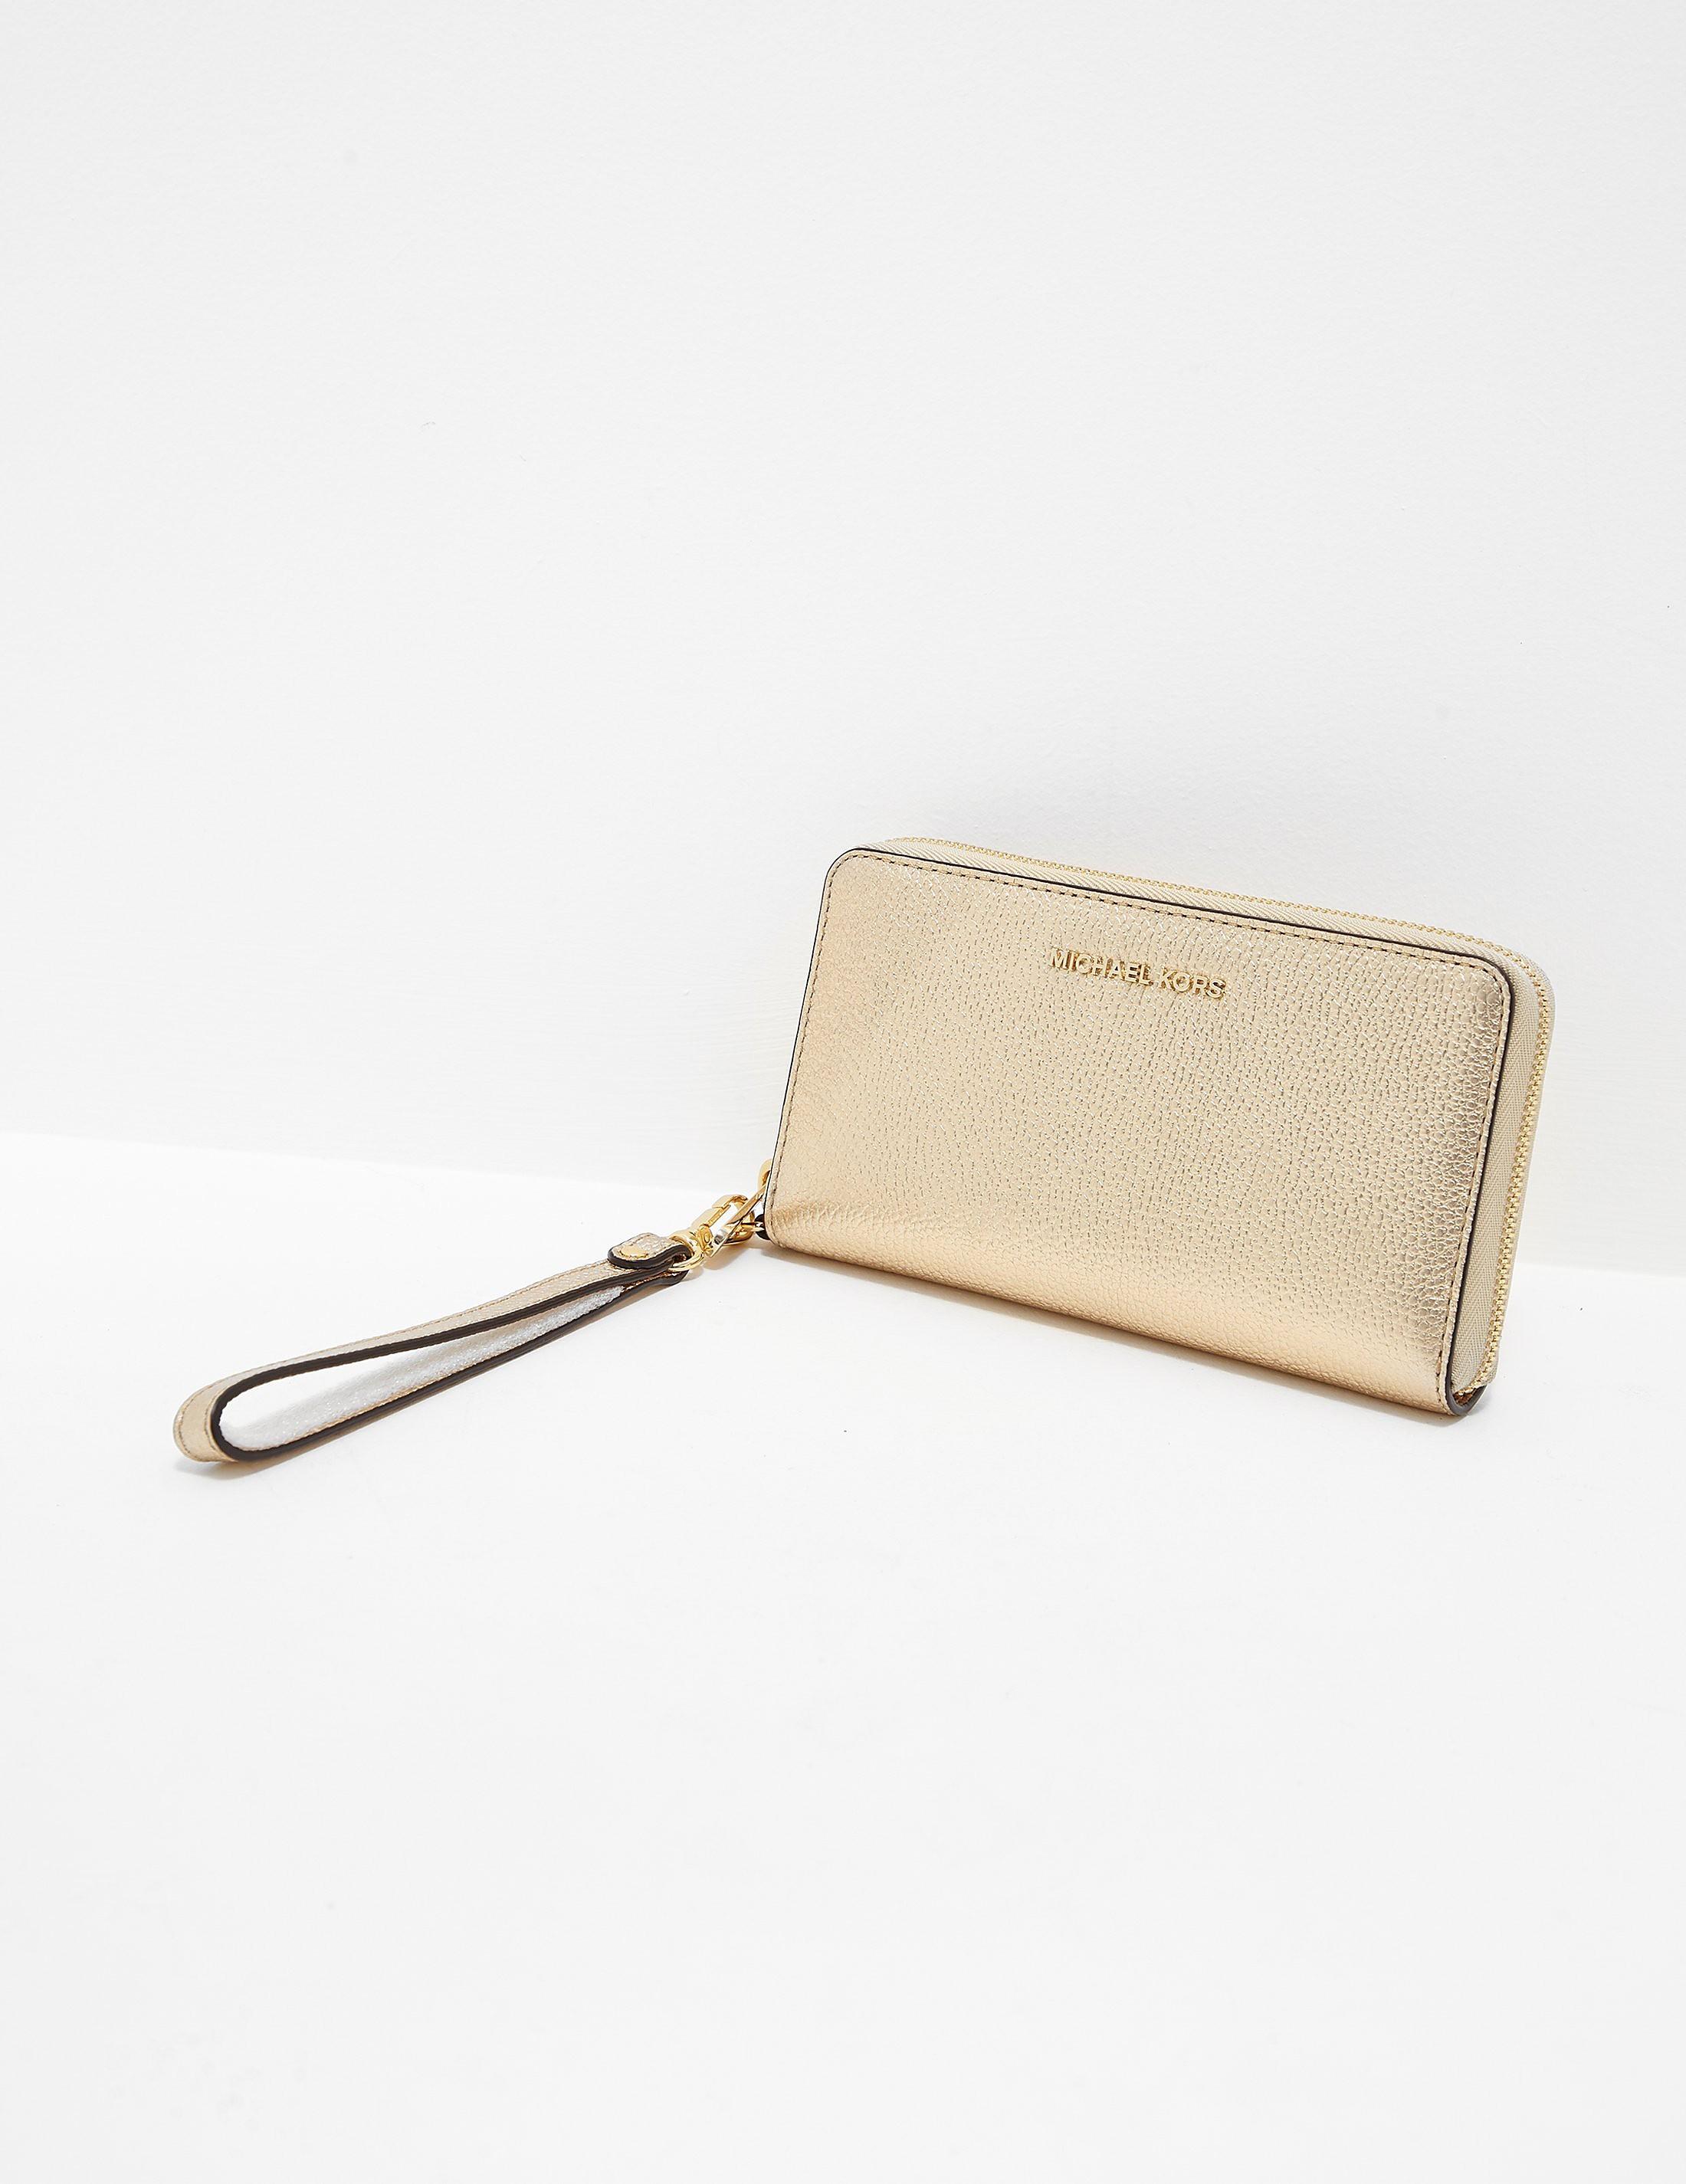 Michael Kors Flat Zip-Around Phone case